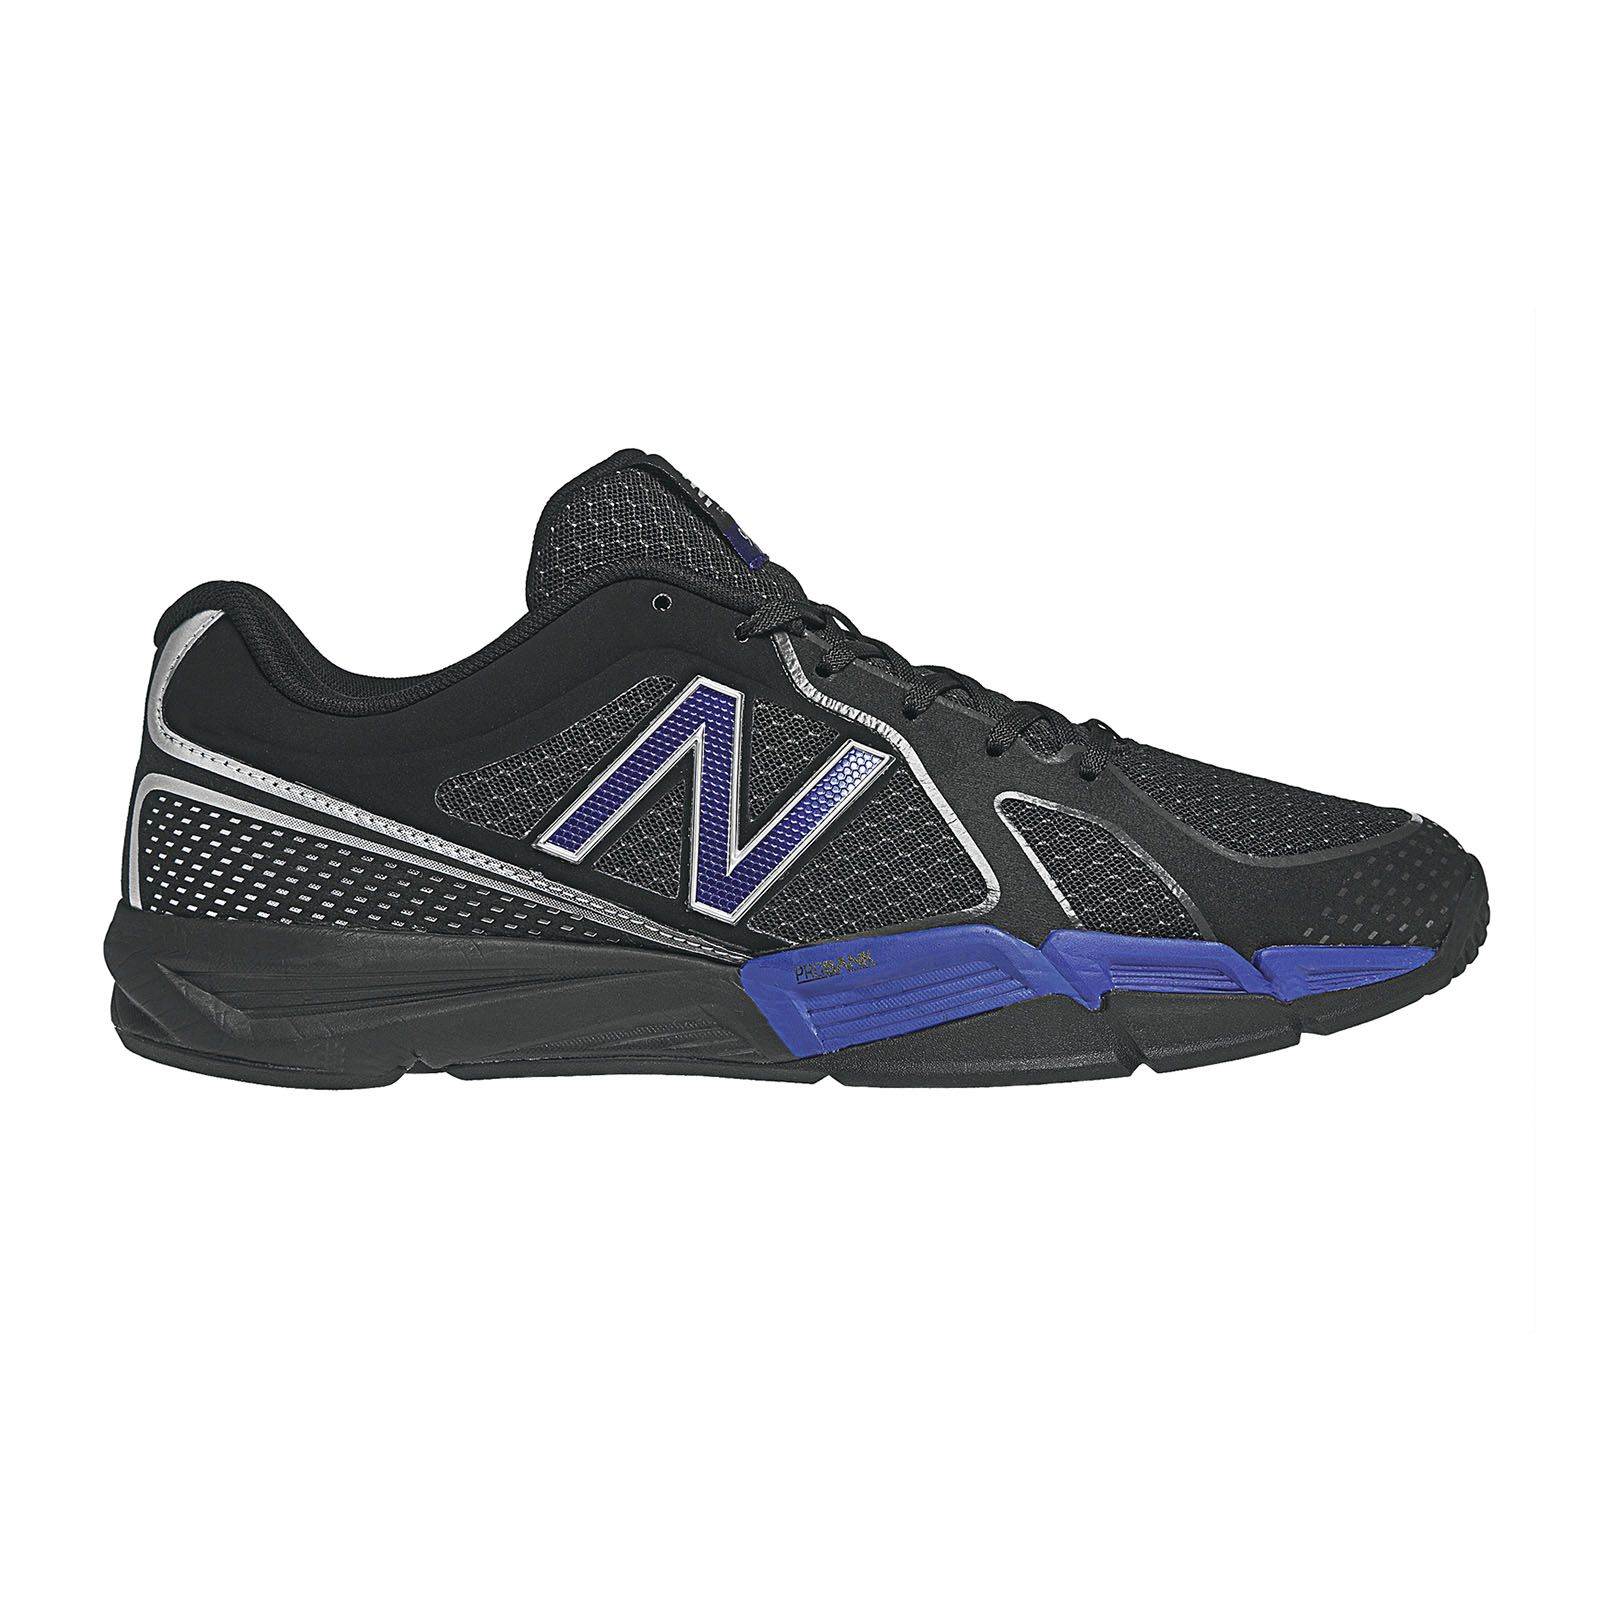 Running Or Cross Training Shoes Badminton